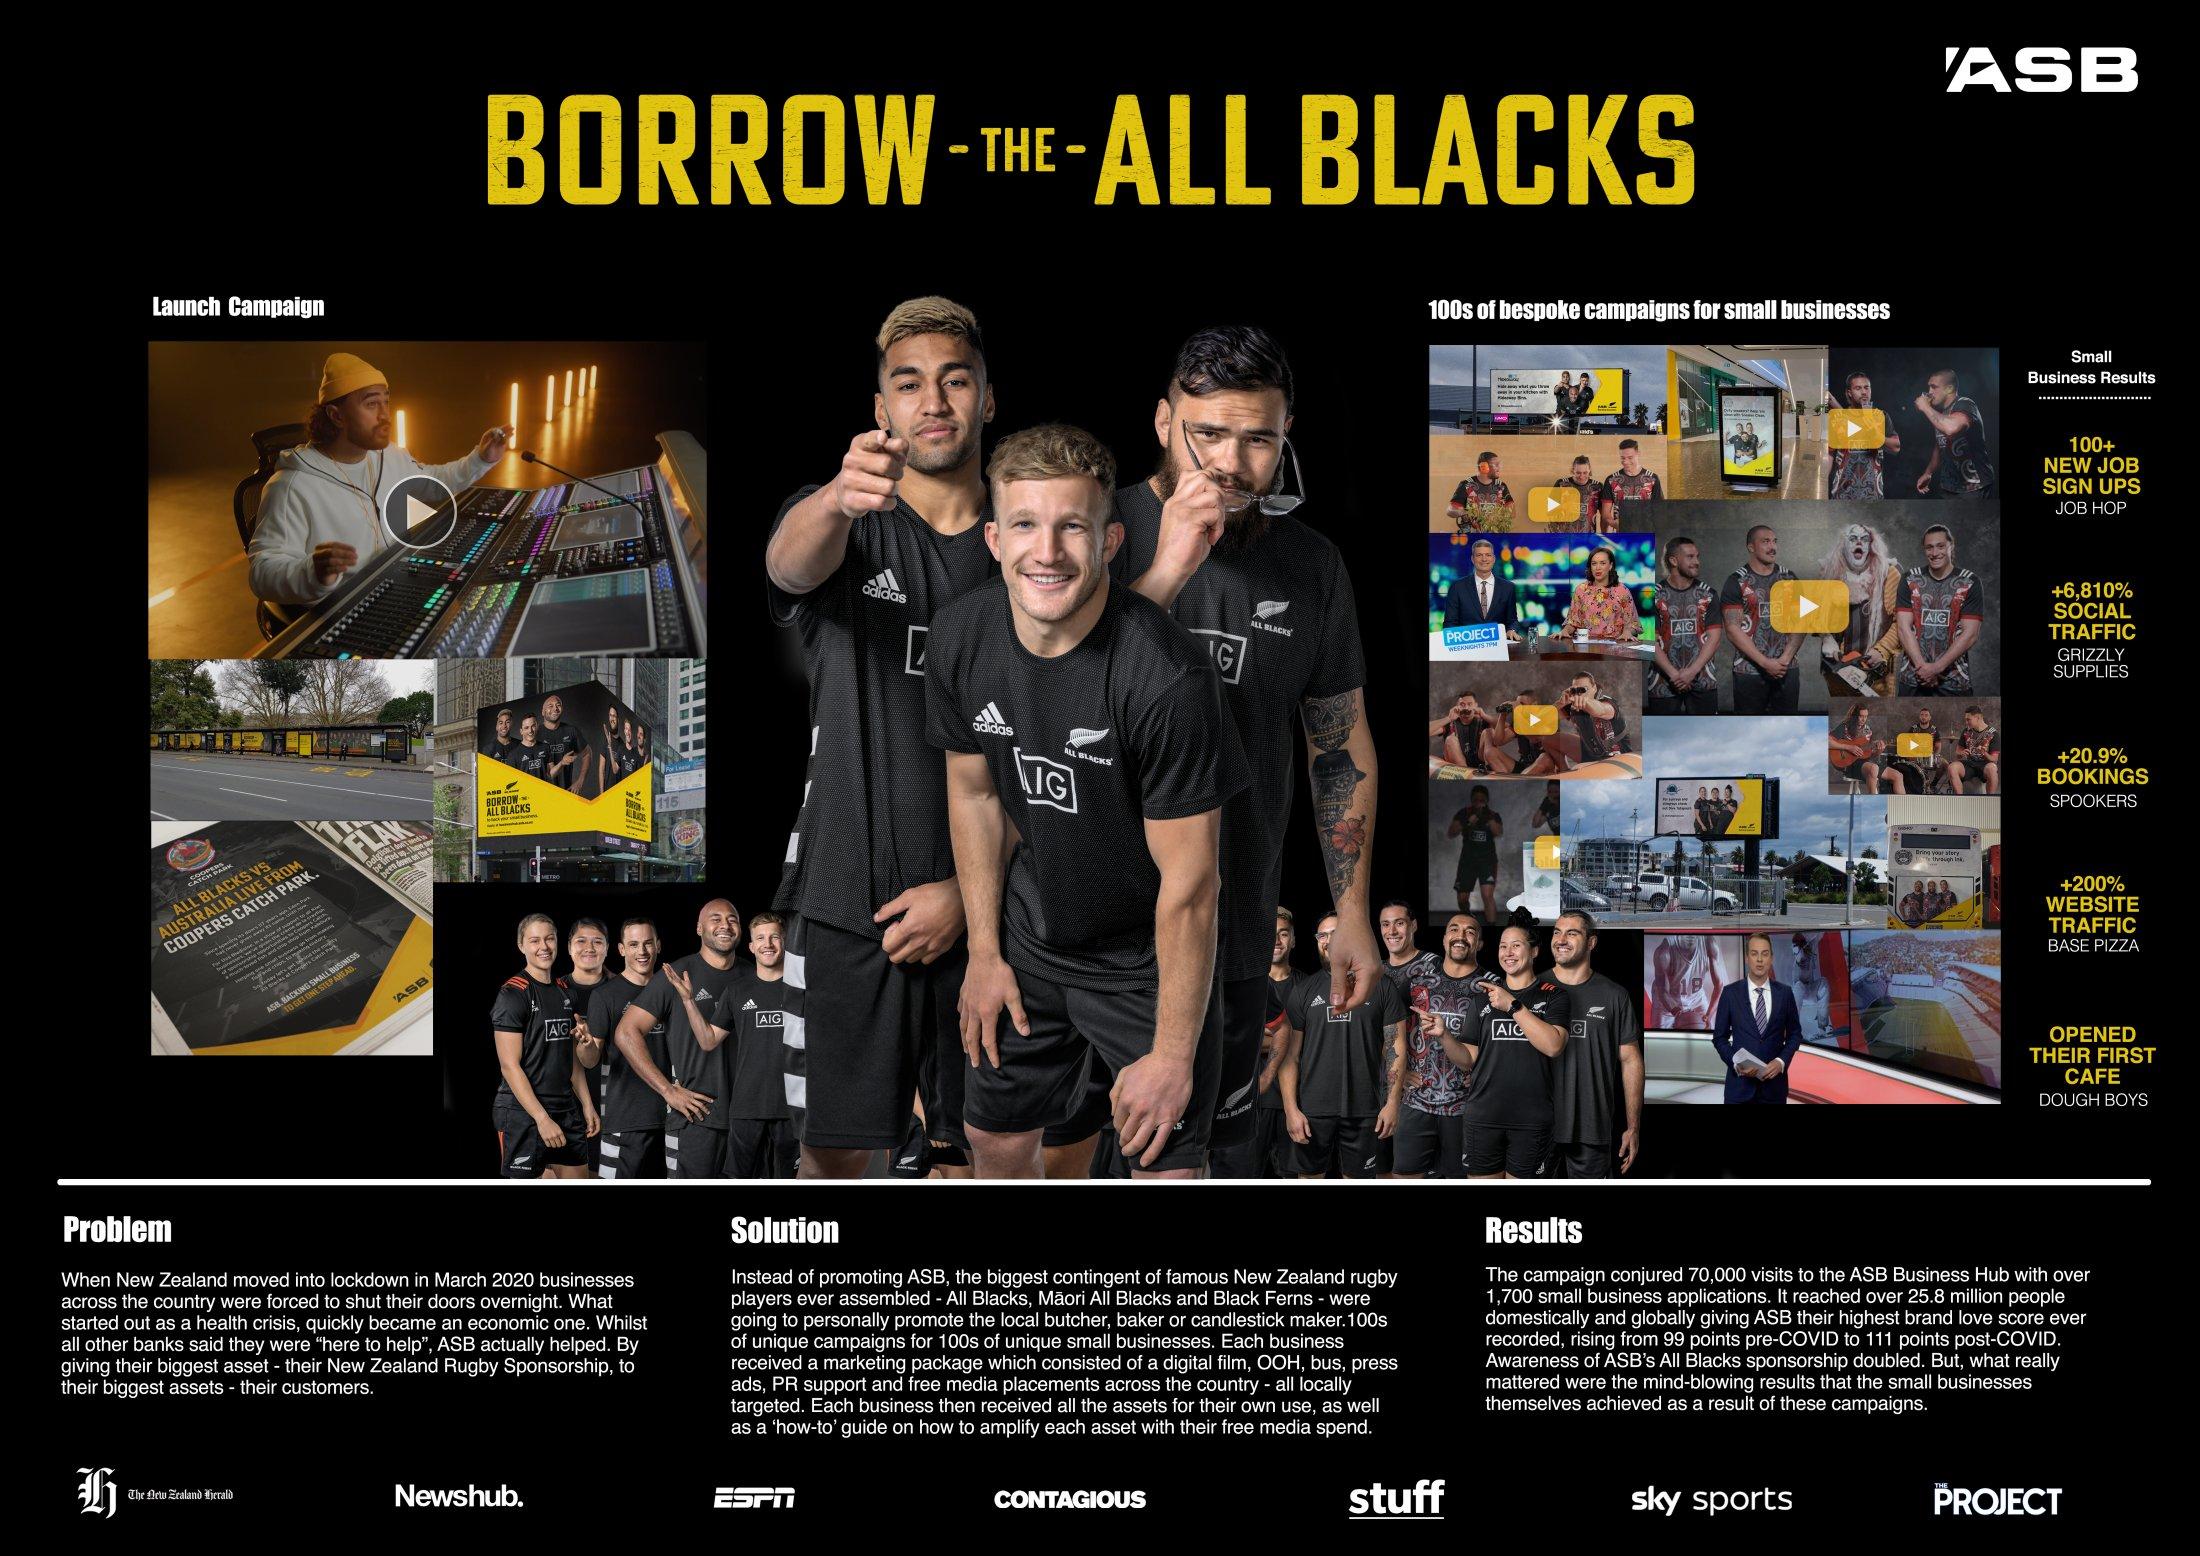 Thumbnail for Borrow the All Blacks